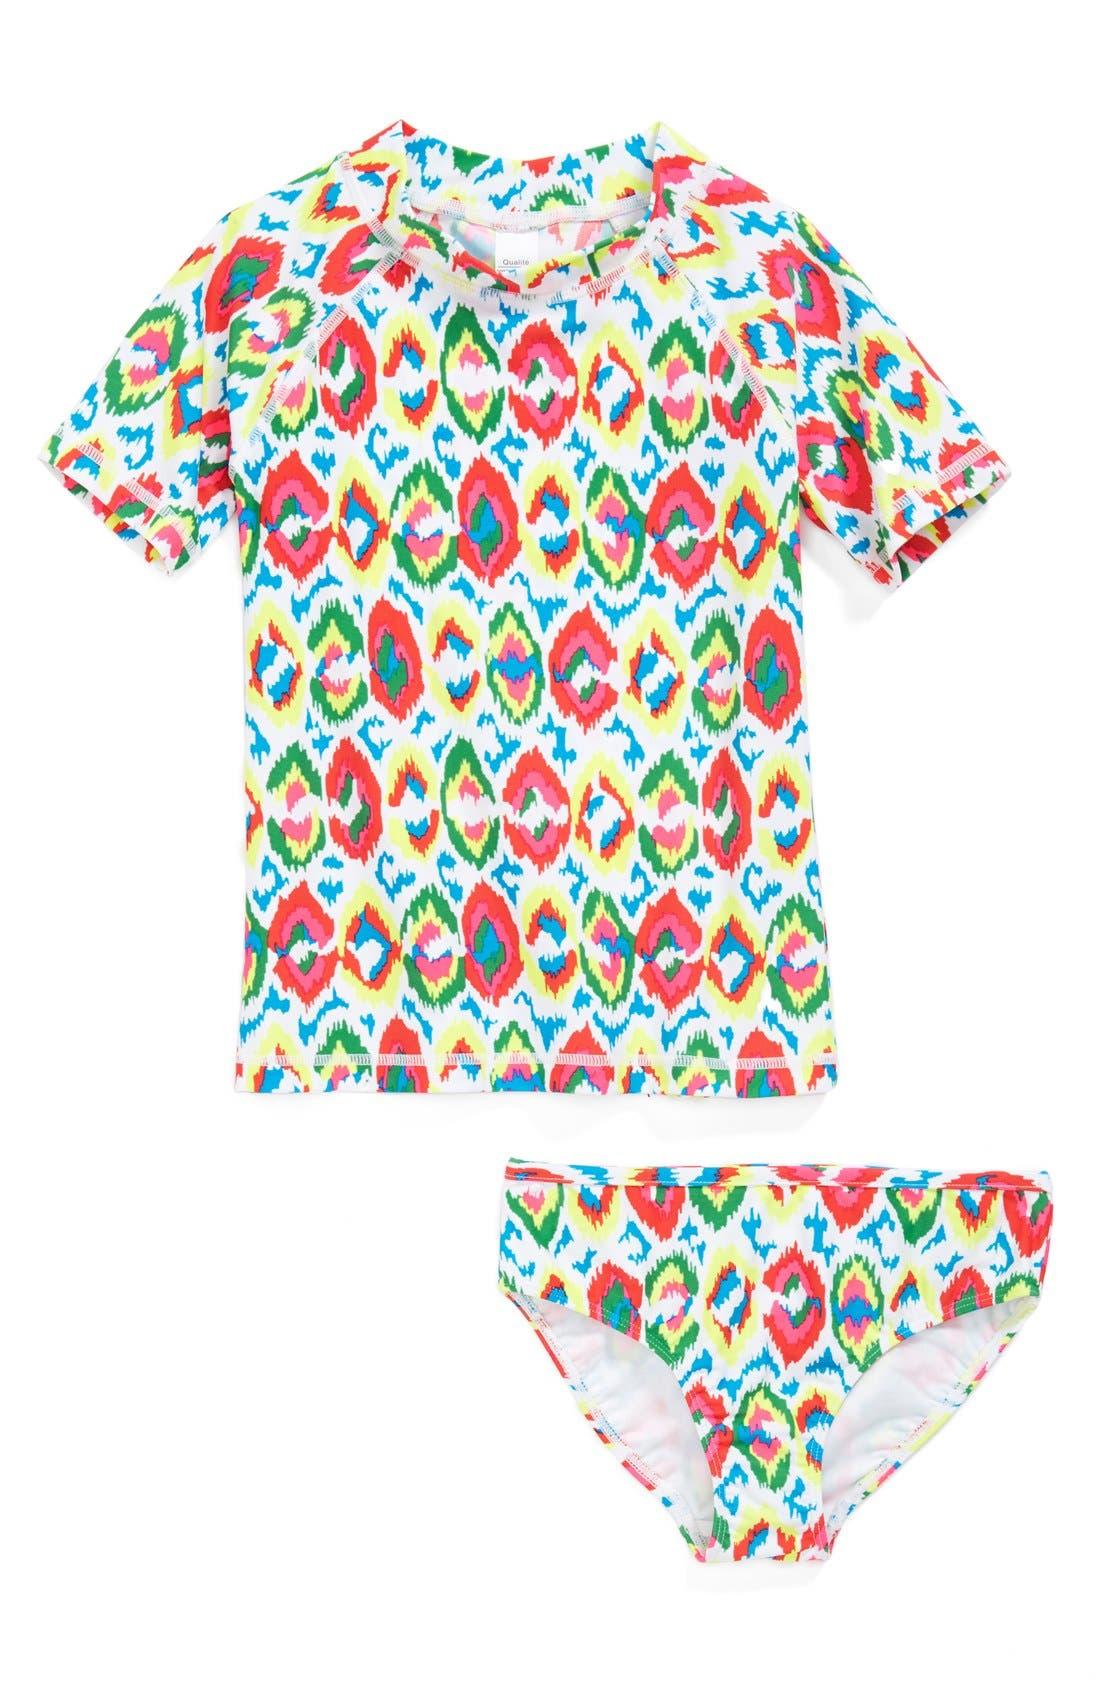 Main Image - Tucker + Tate Rashguard Shirt & Bottoms (Toddler Girls)